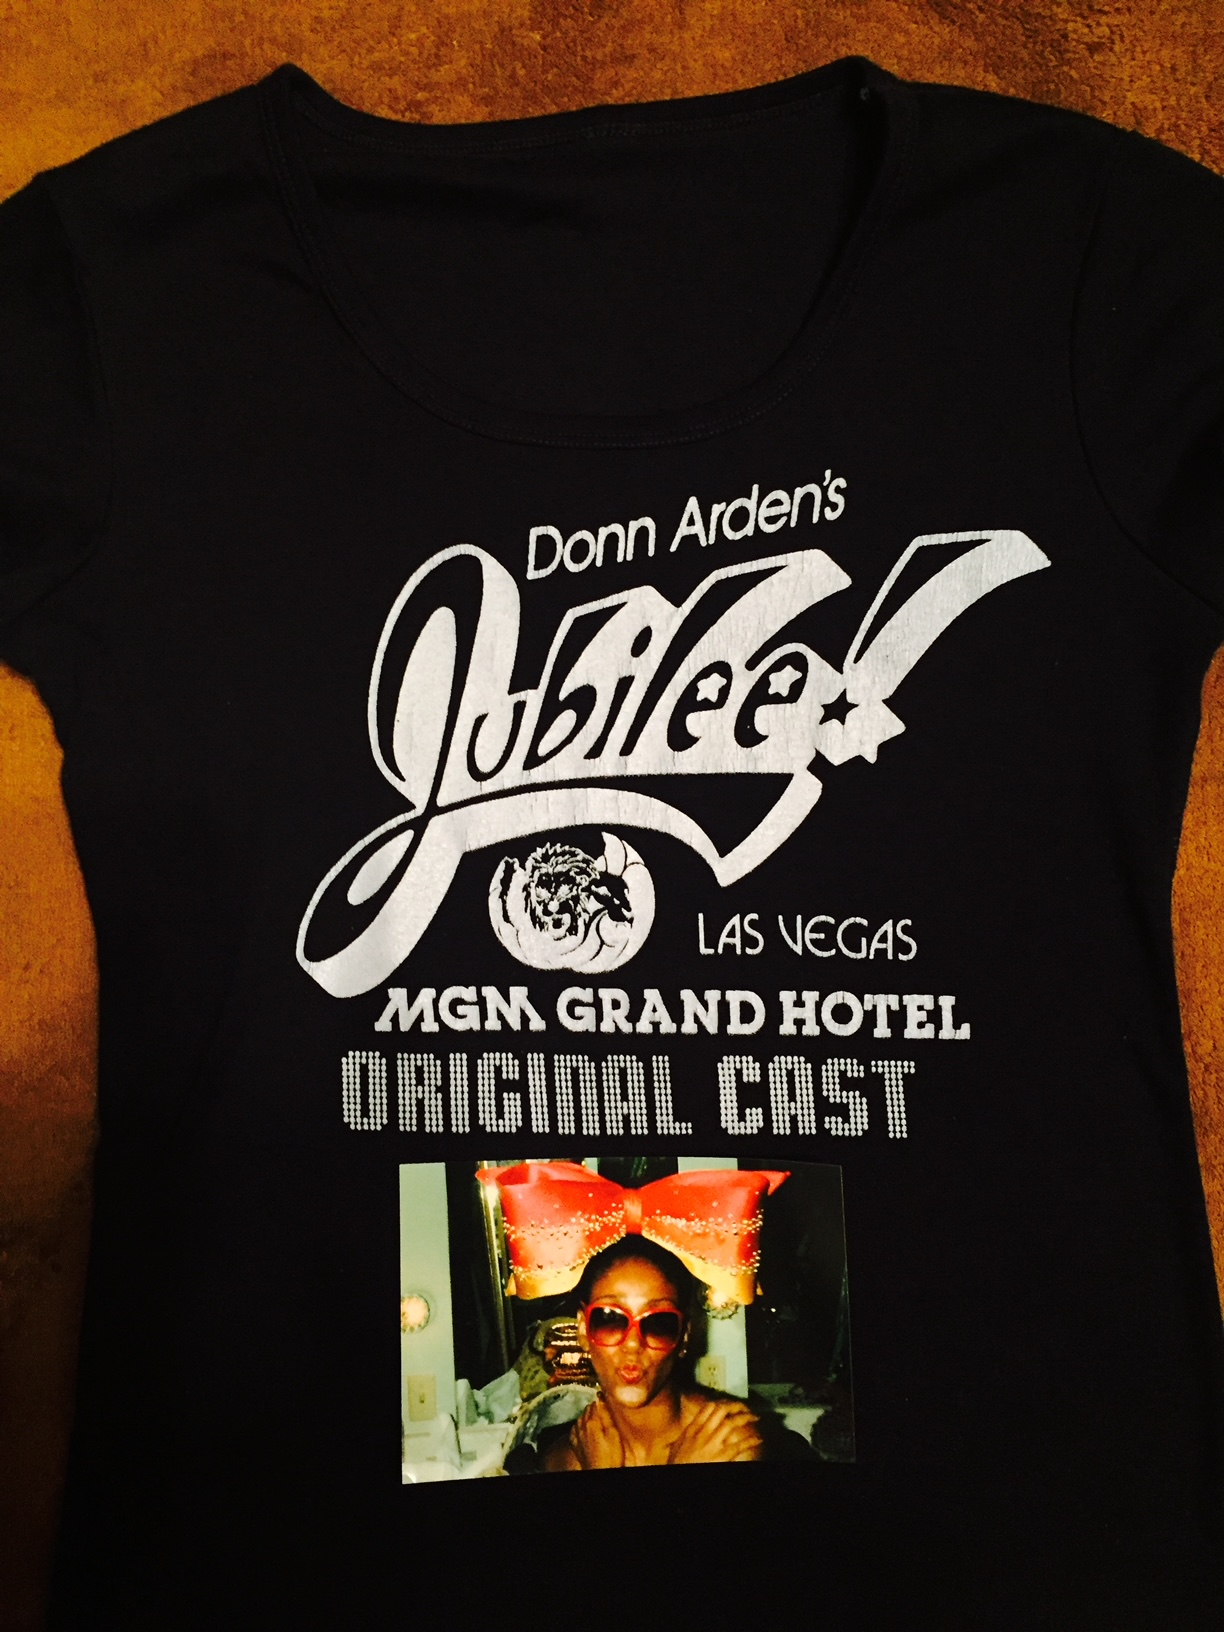 Donn Arden's Jubilee! MGM Grand Hotel Las Vegas 1981, Original Cast tshirt, courtesy of Dollie Eaglin